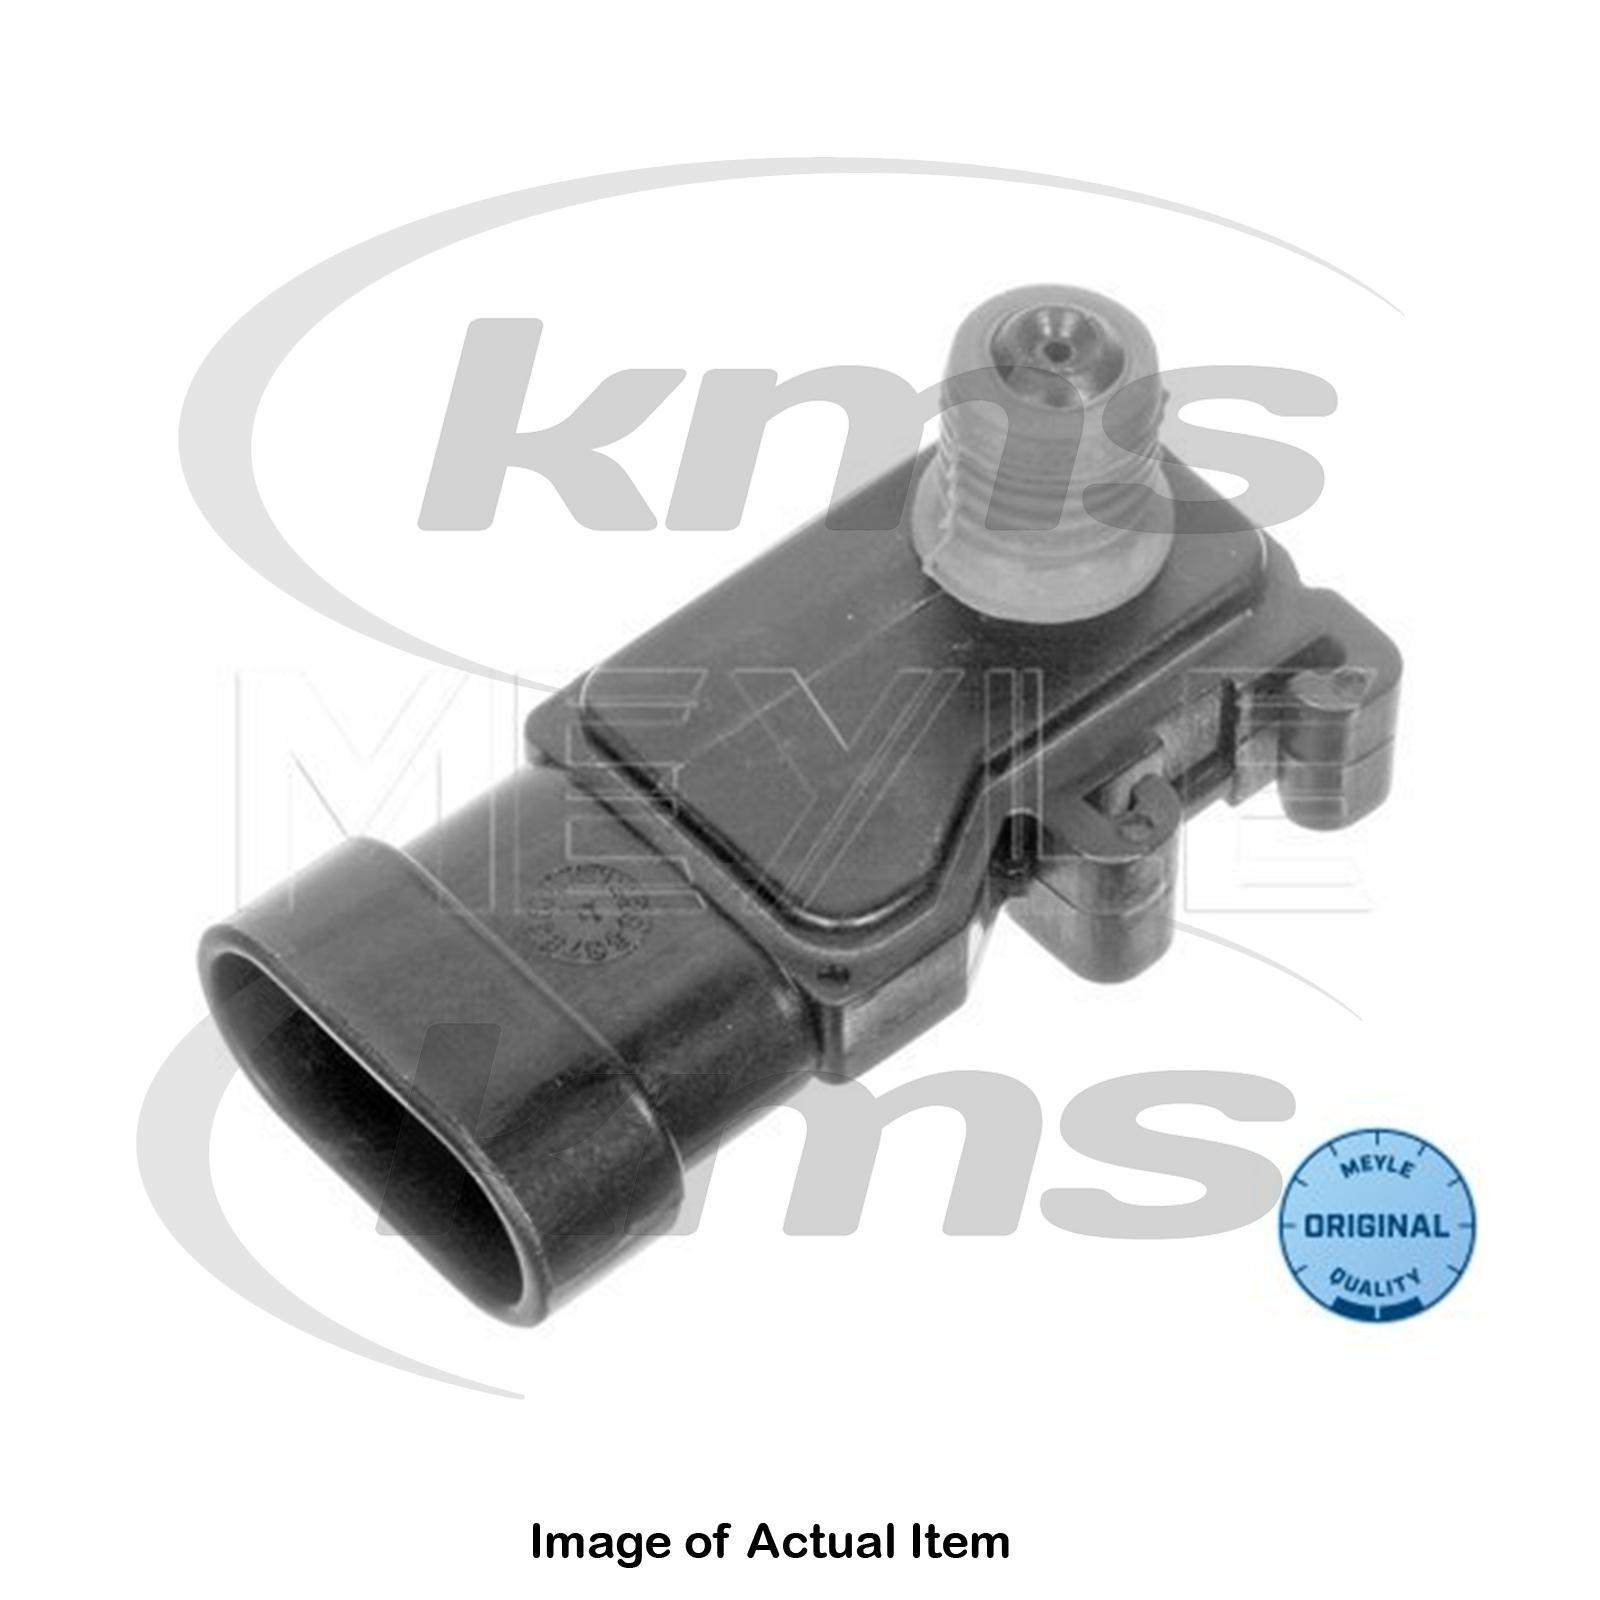 2016 Chevrolet Sonic Head Gasket: New Genuine MEYLE Intake Manifold Pressure Sensor